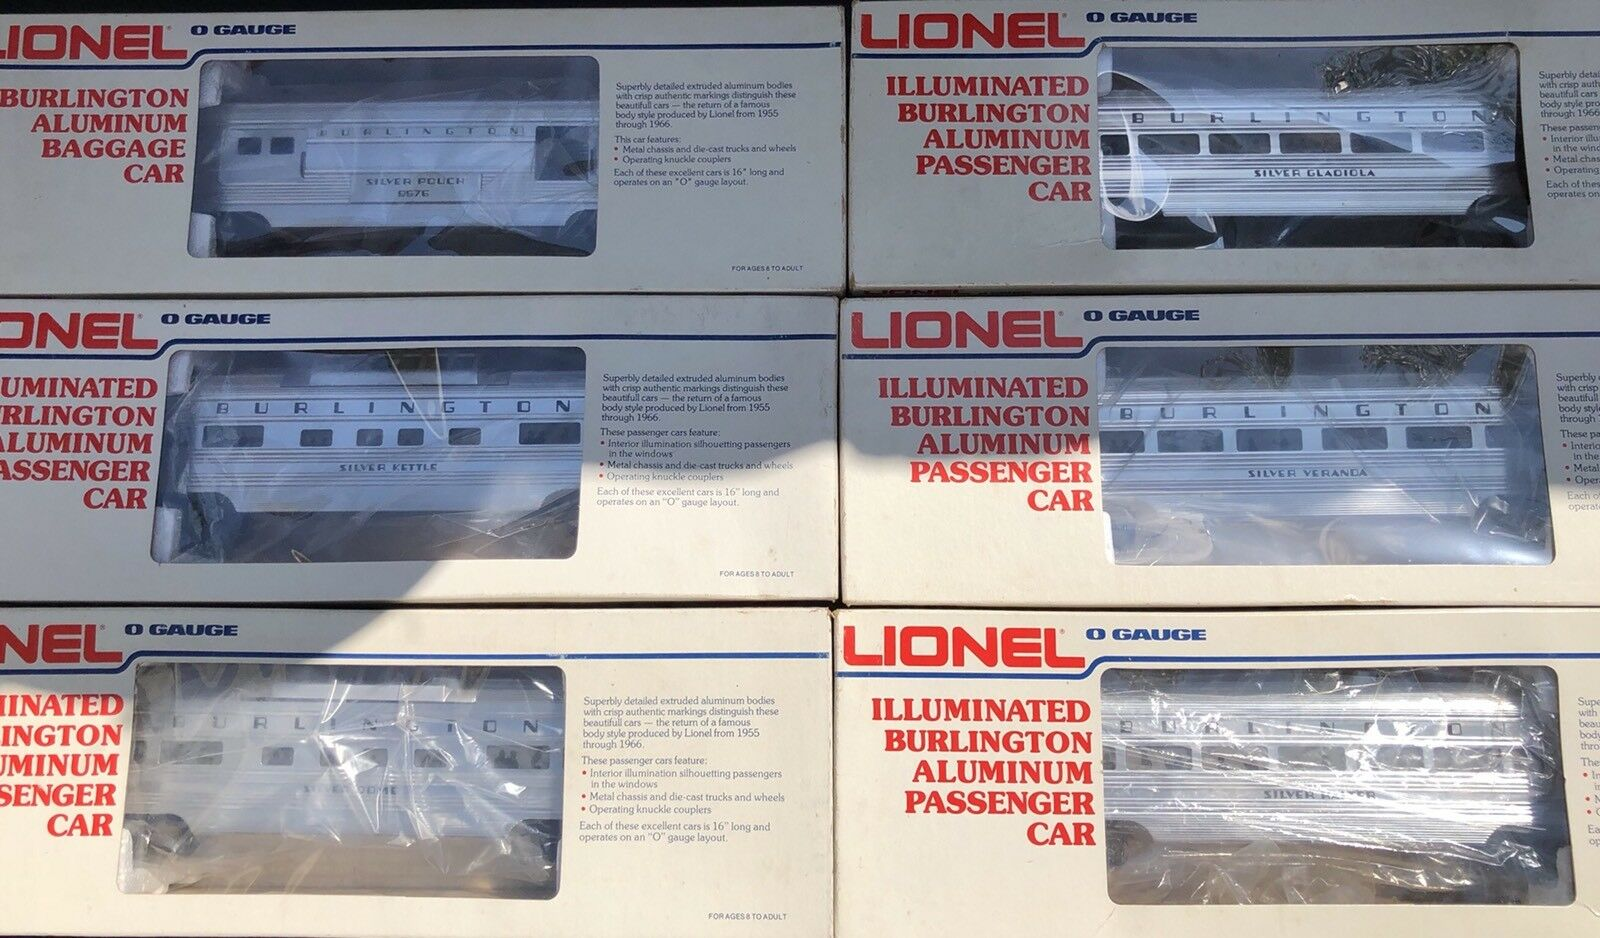 LIONEL BURLINGTON BURLINGTON BURLINGTON ALUMINUM 6 CAR PASSENGER SET 036648